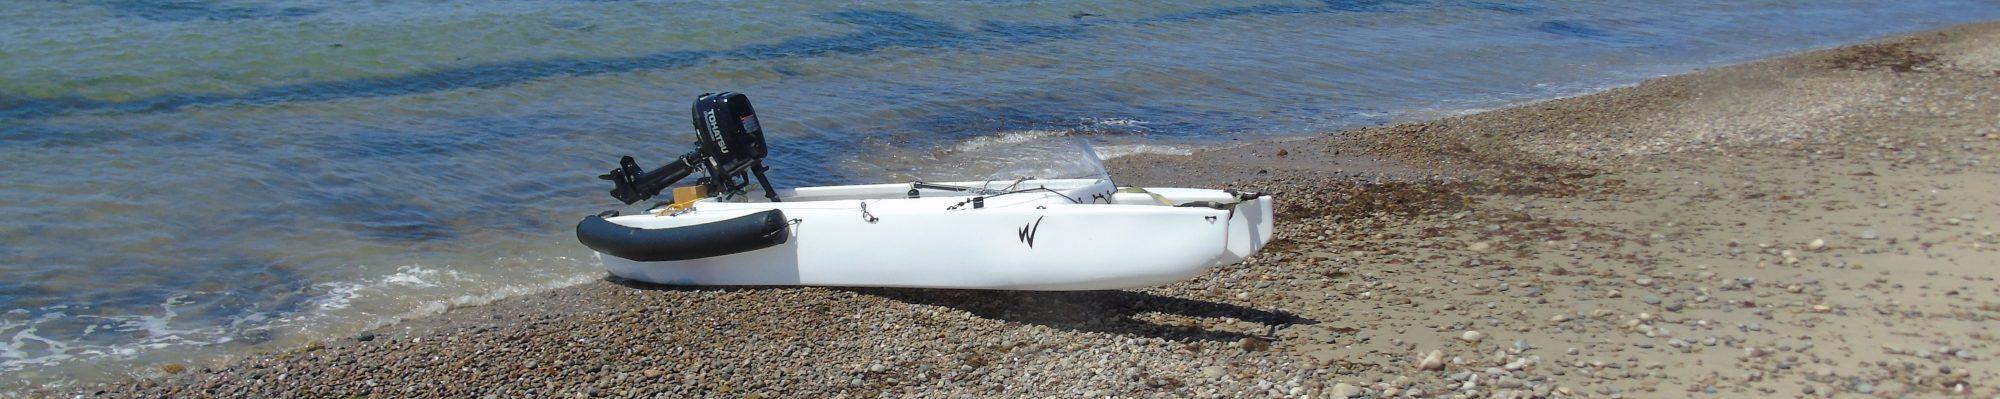 Texas fishing kayaks and skiffs